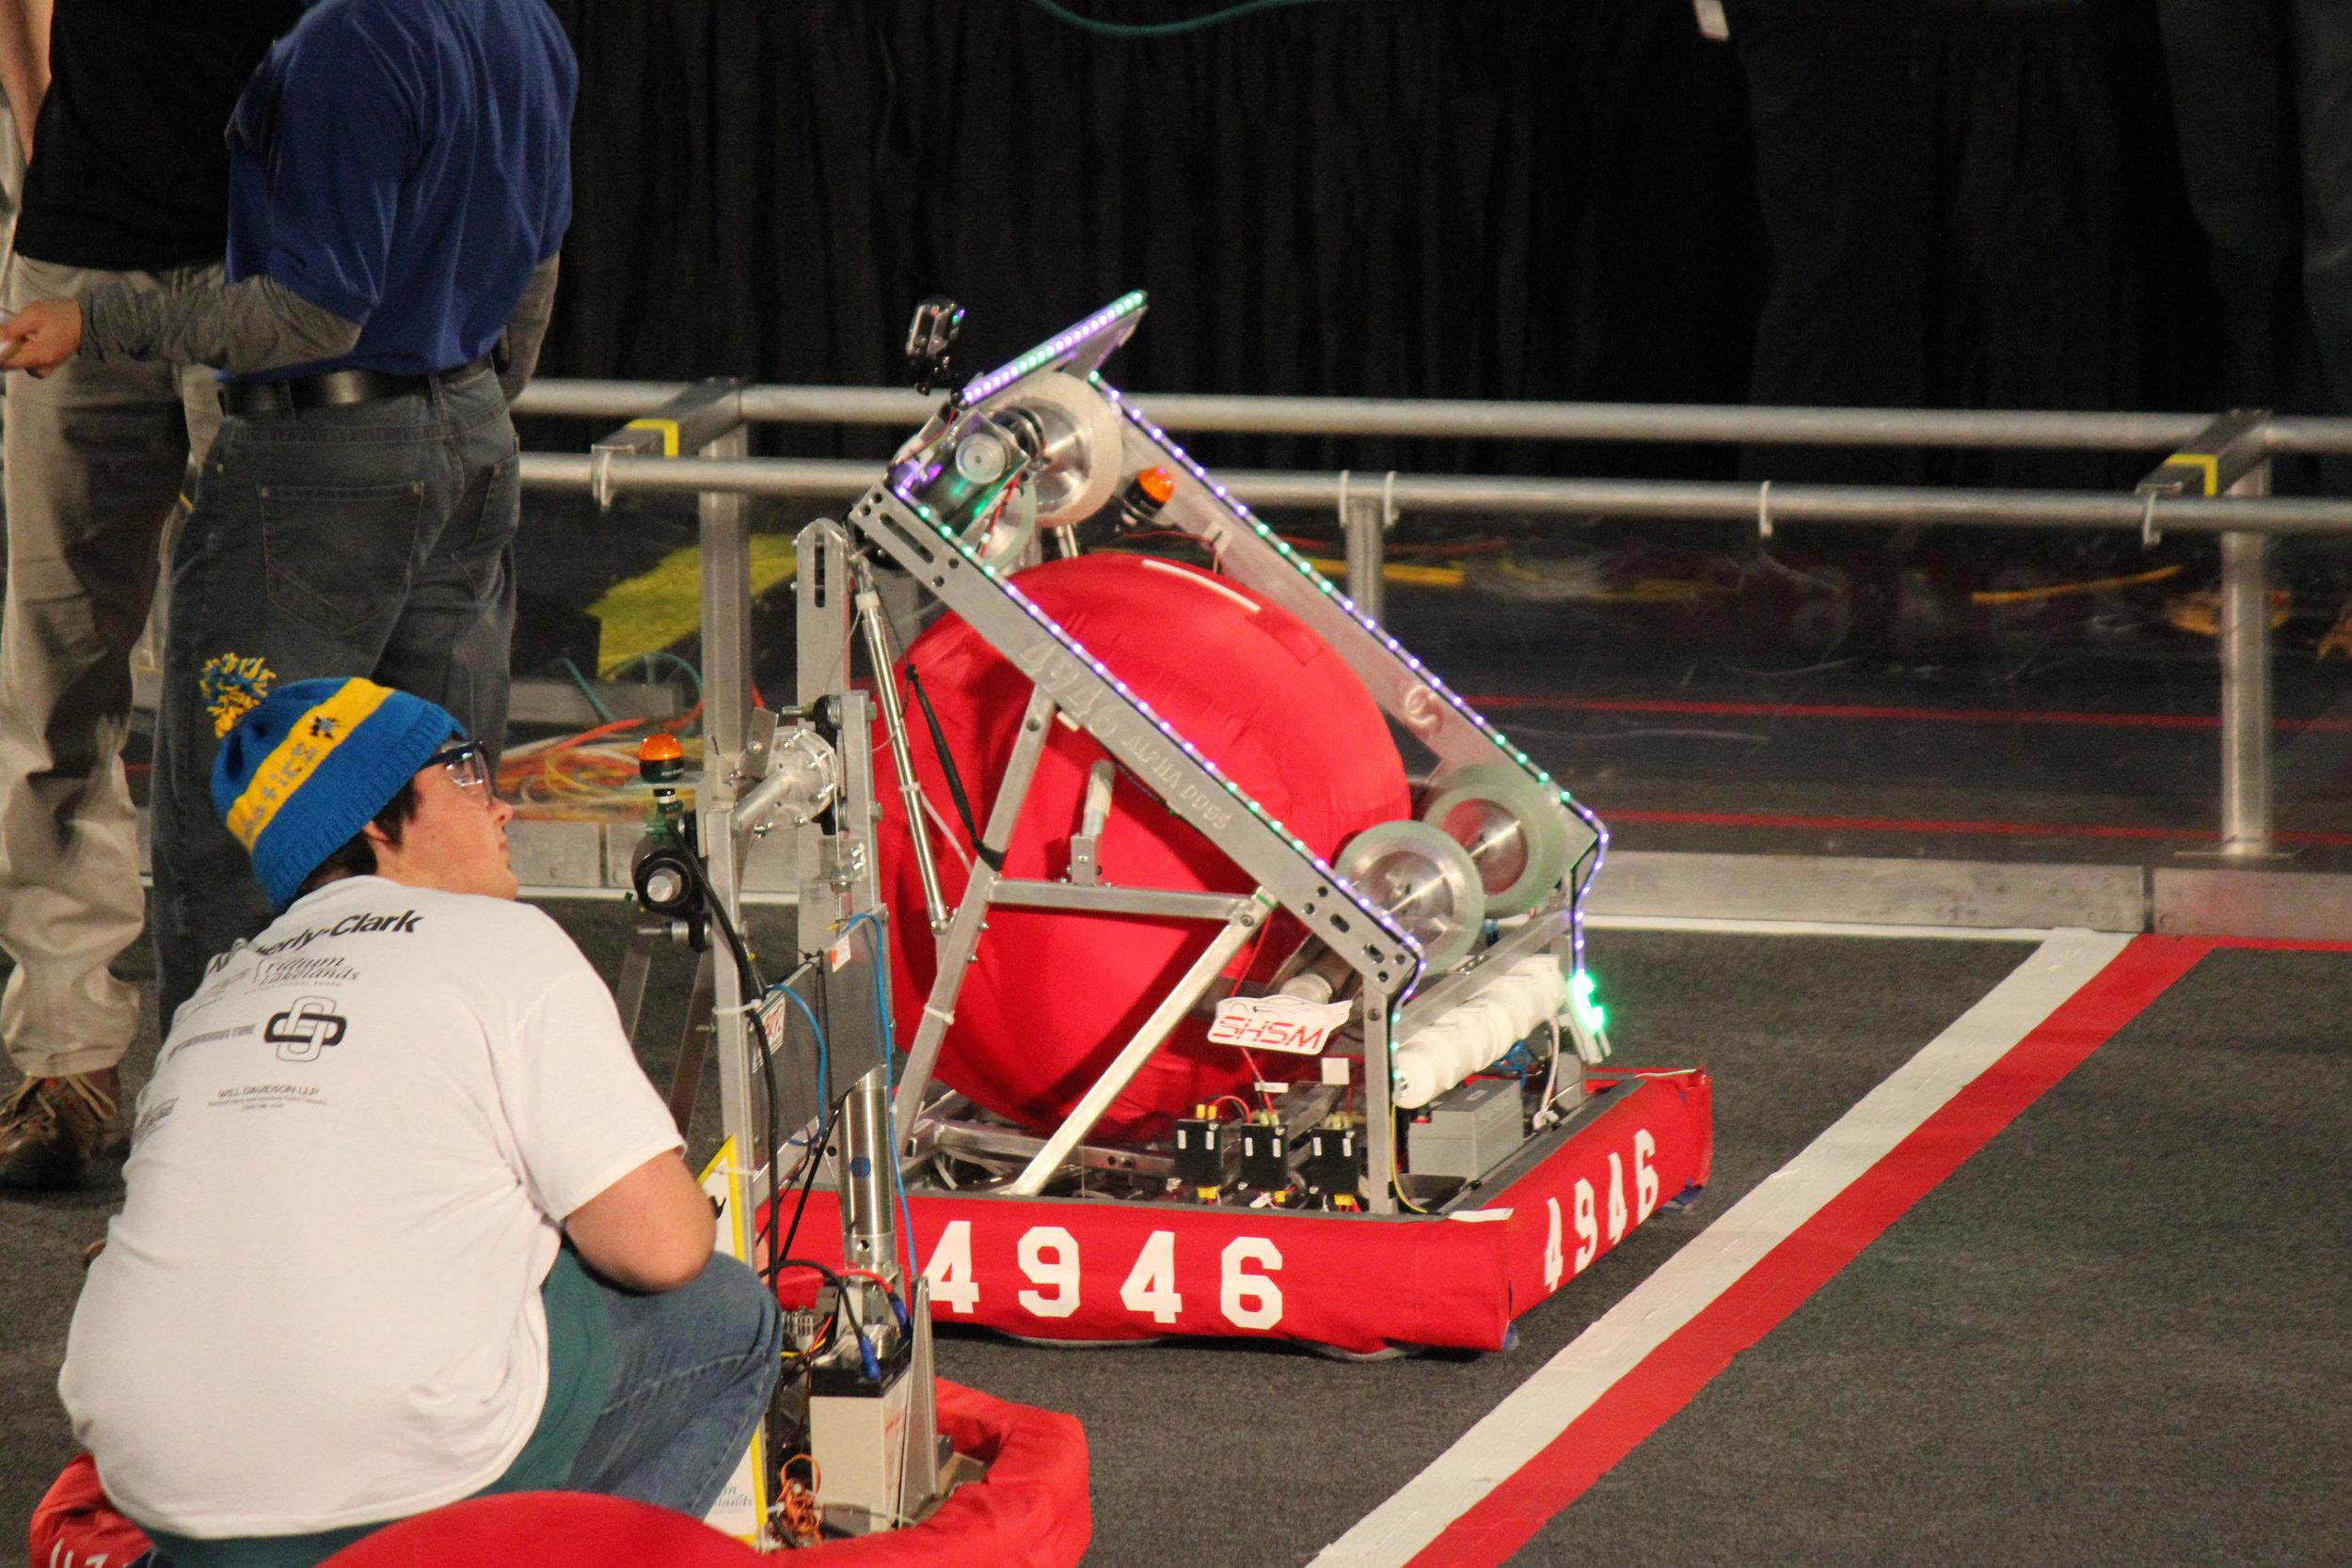 Our 2014 Robot, Alph